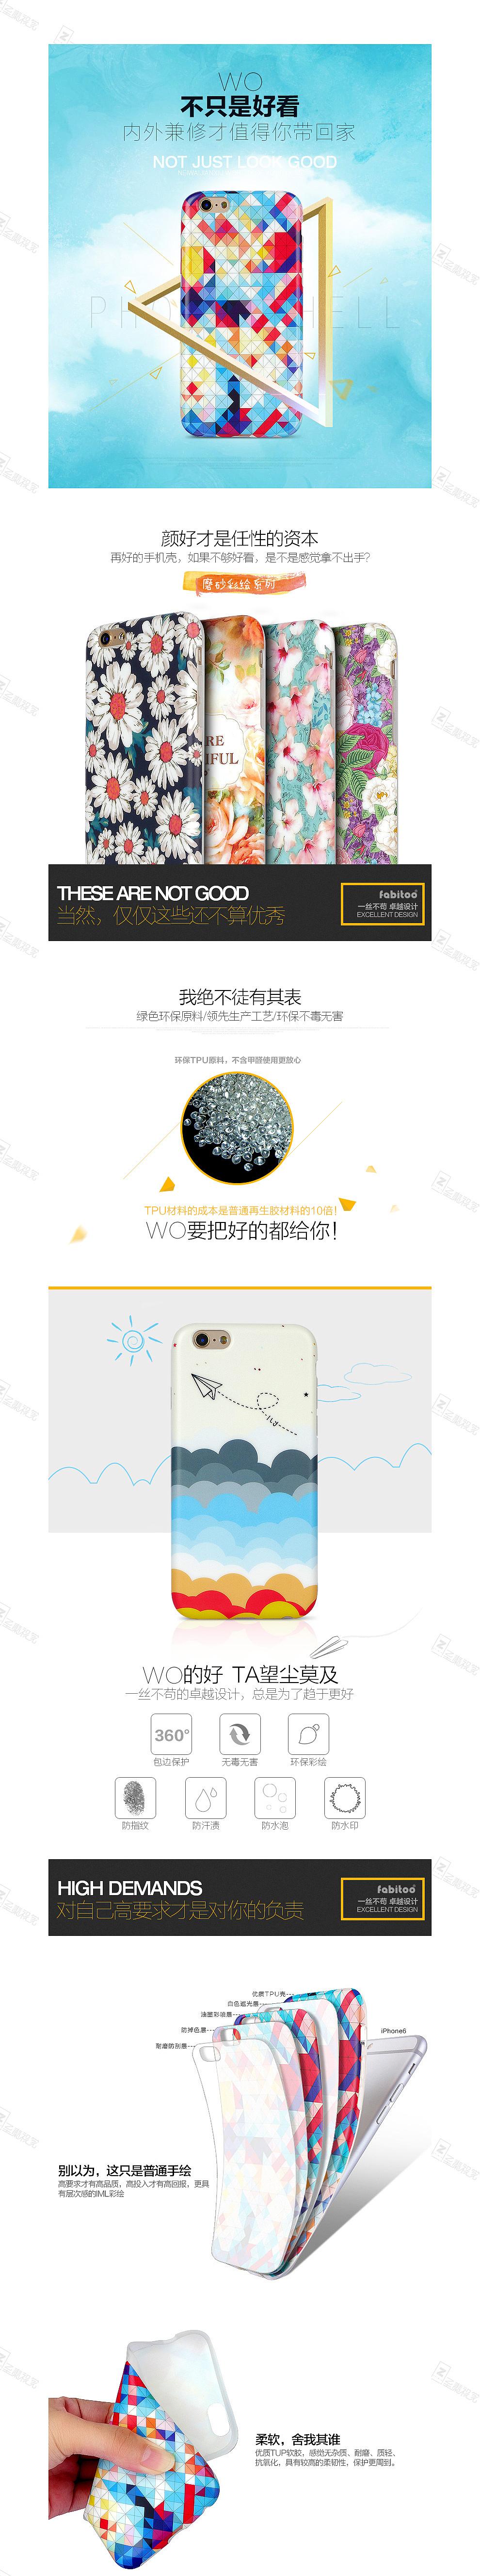 iphone6创意手机壳淘宝天猫详情页模板设计/产品图片